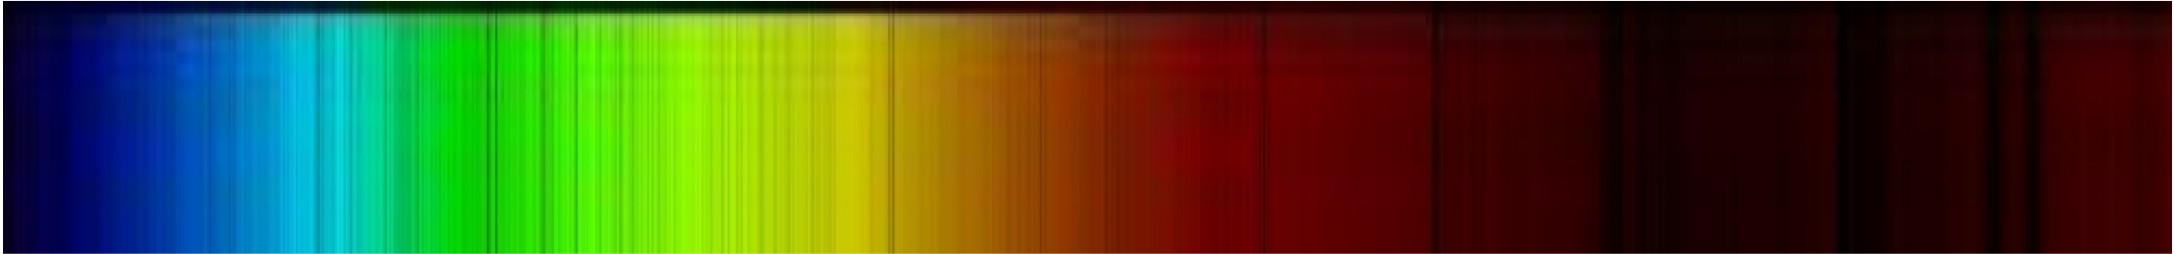 SolarSpec_Colour